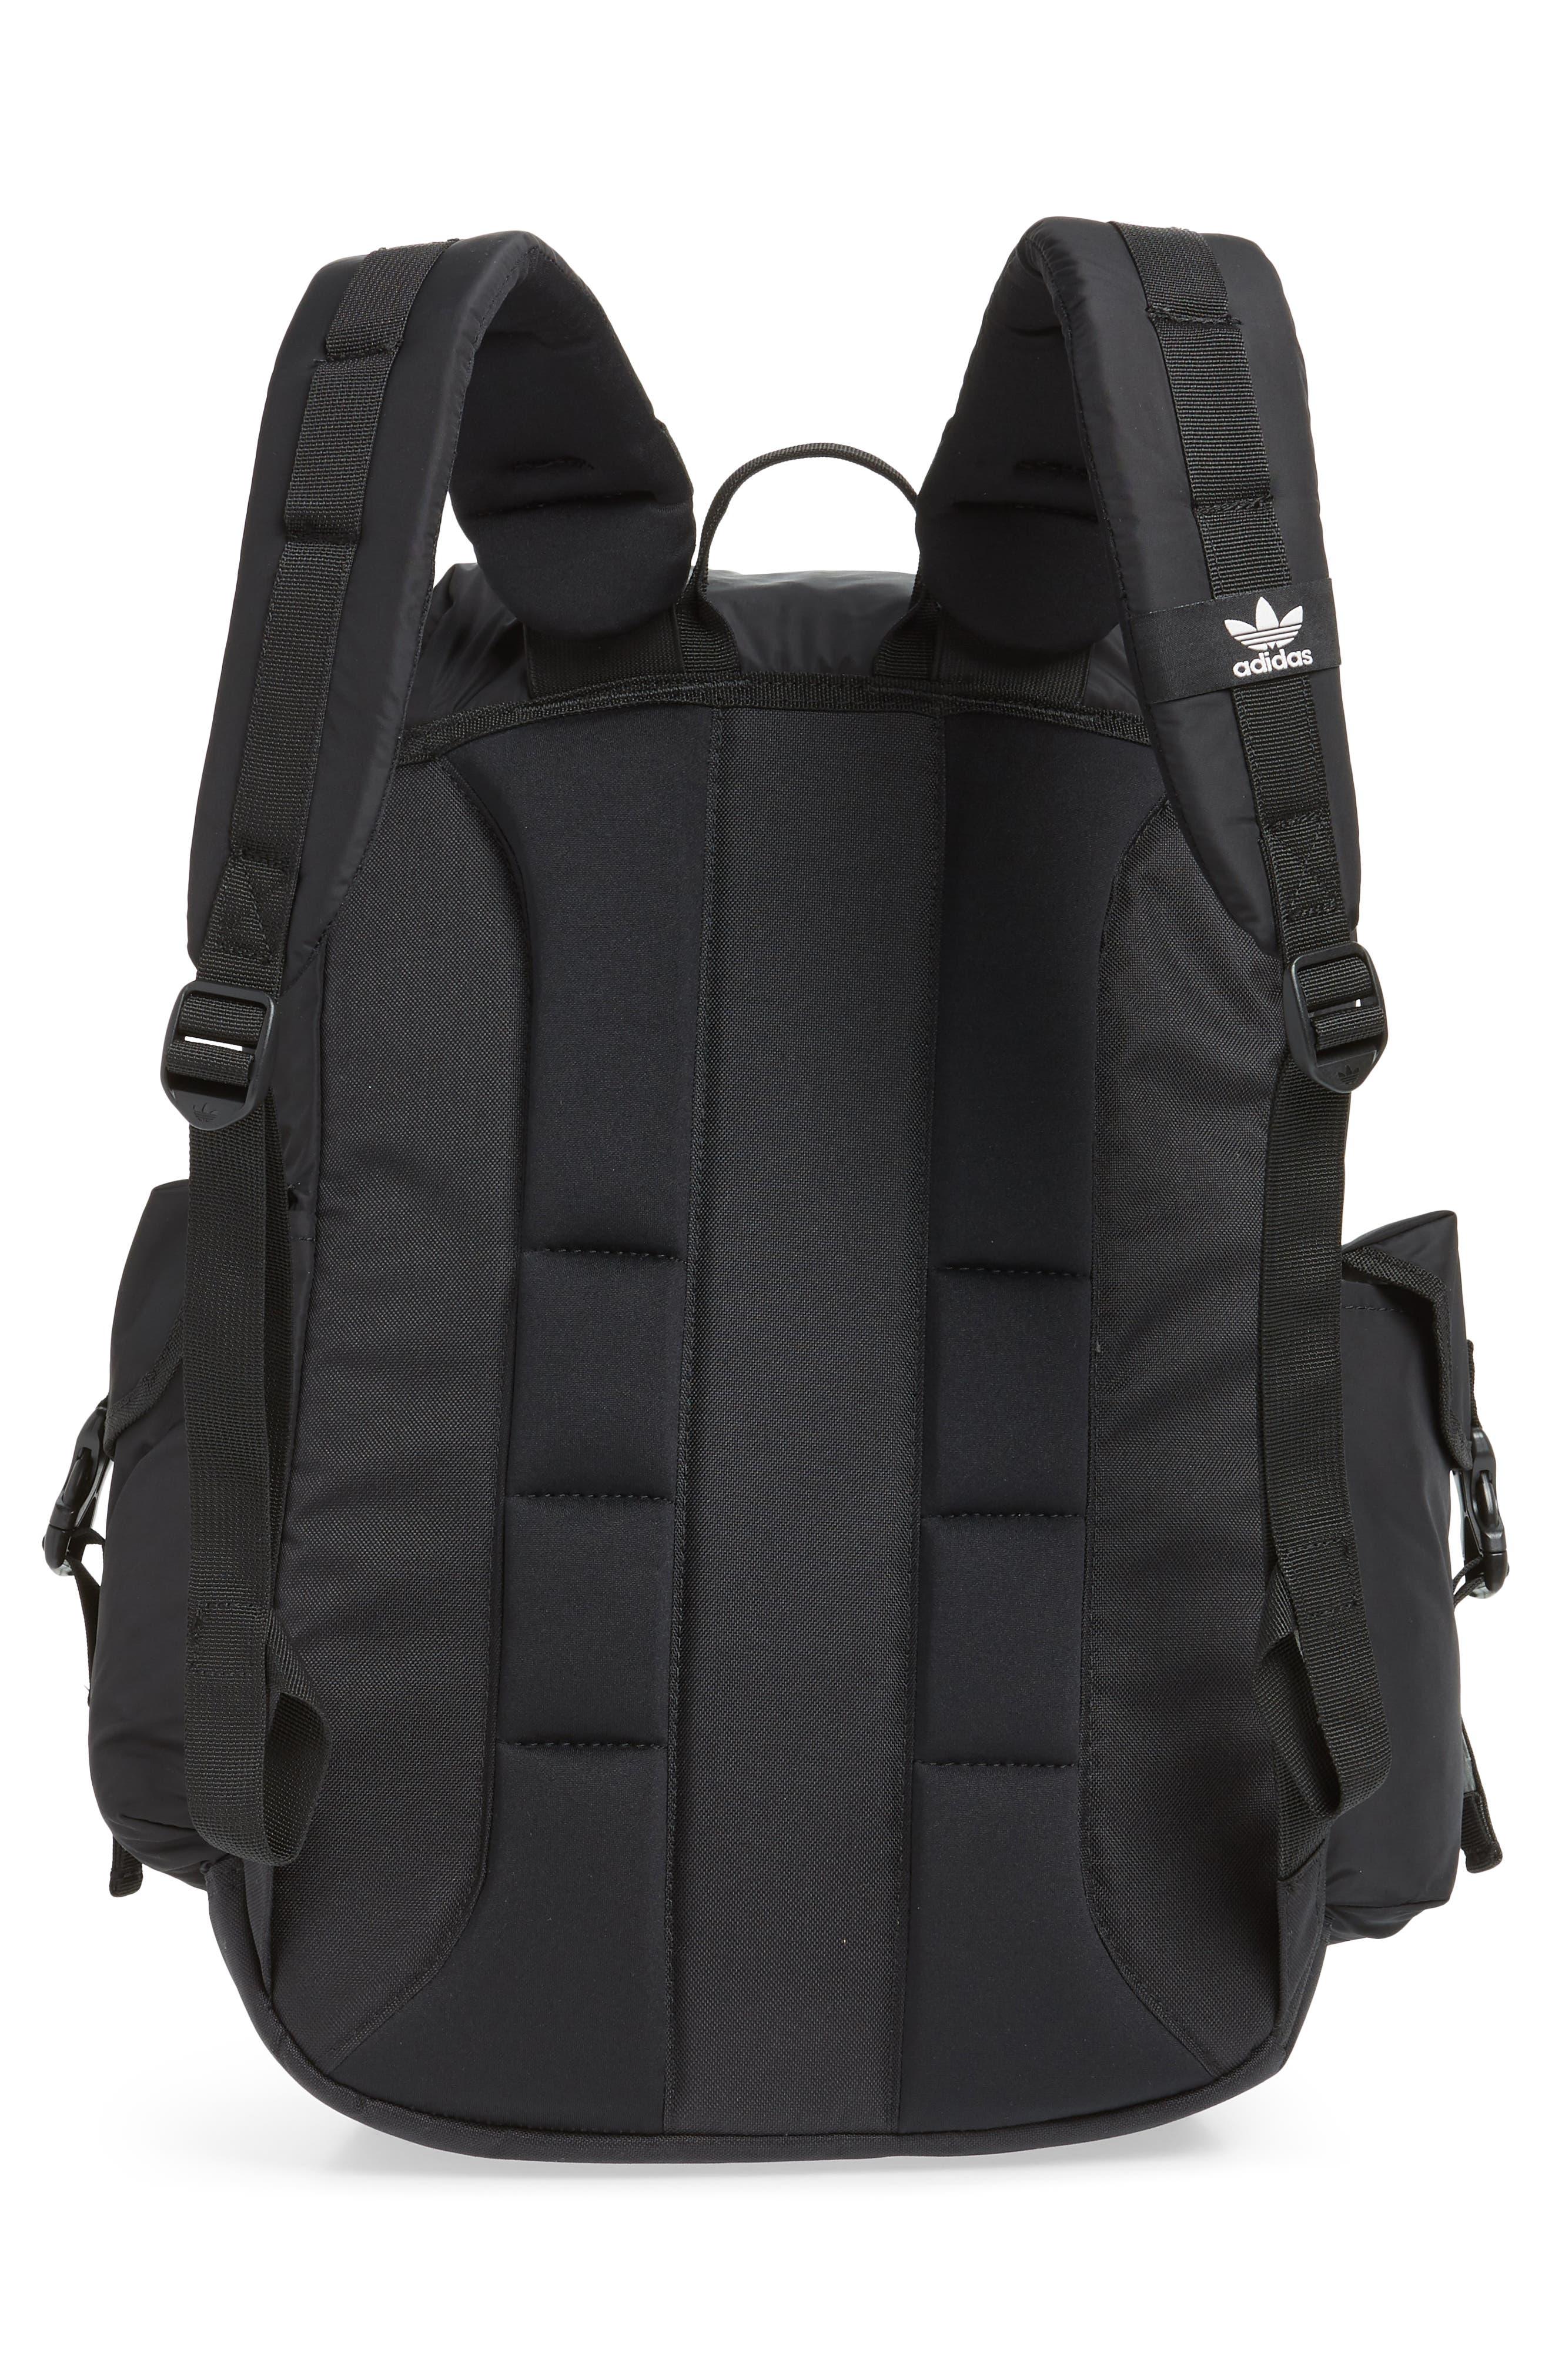 Urban Utility Backpack,                             Alternate thumbnail 3, color,                             001